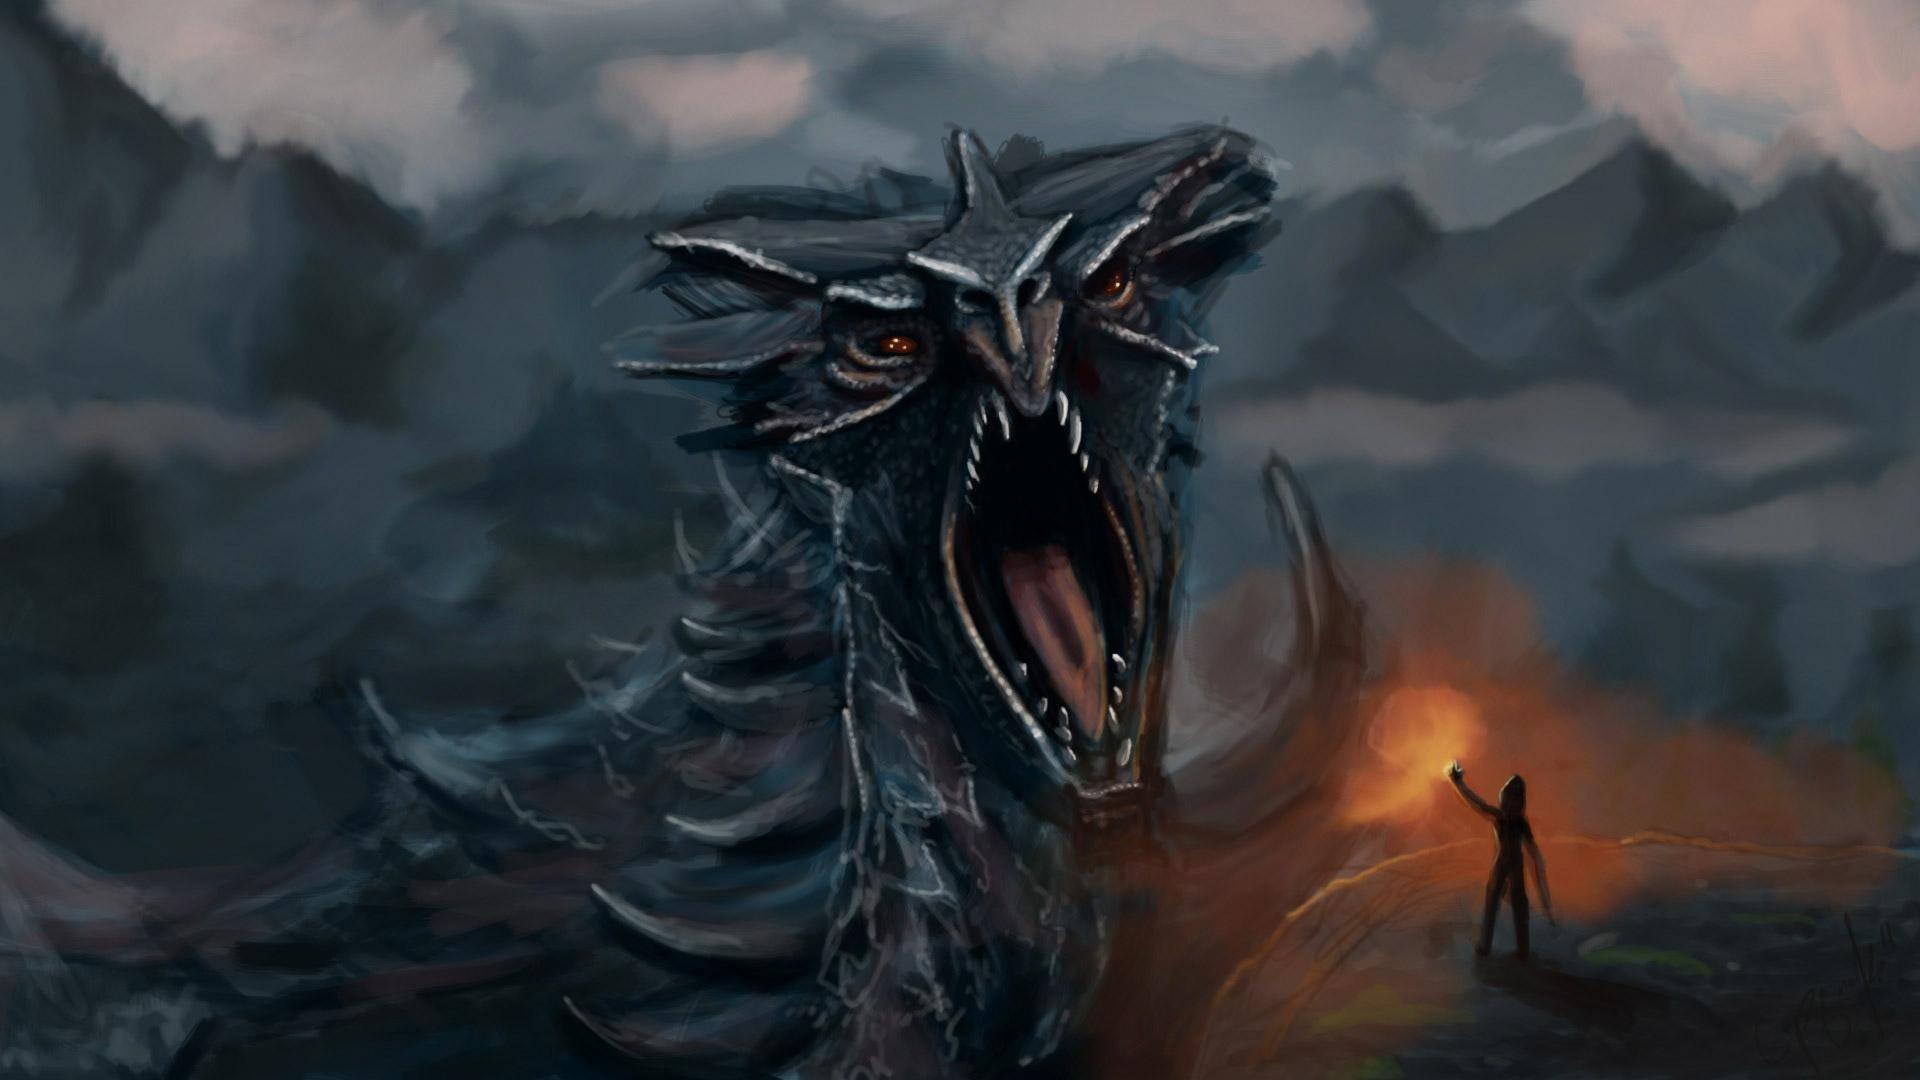 Dragon-skyrim-wallpaper-background-free-1